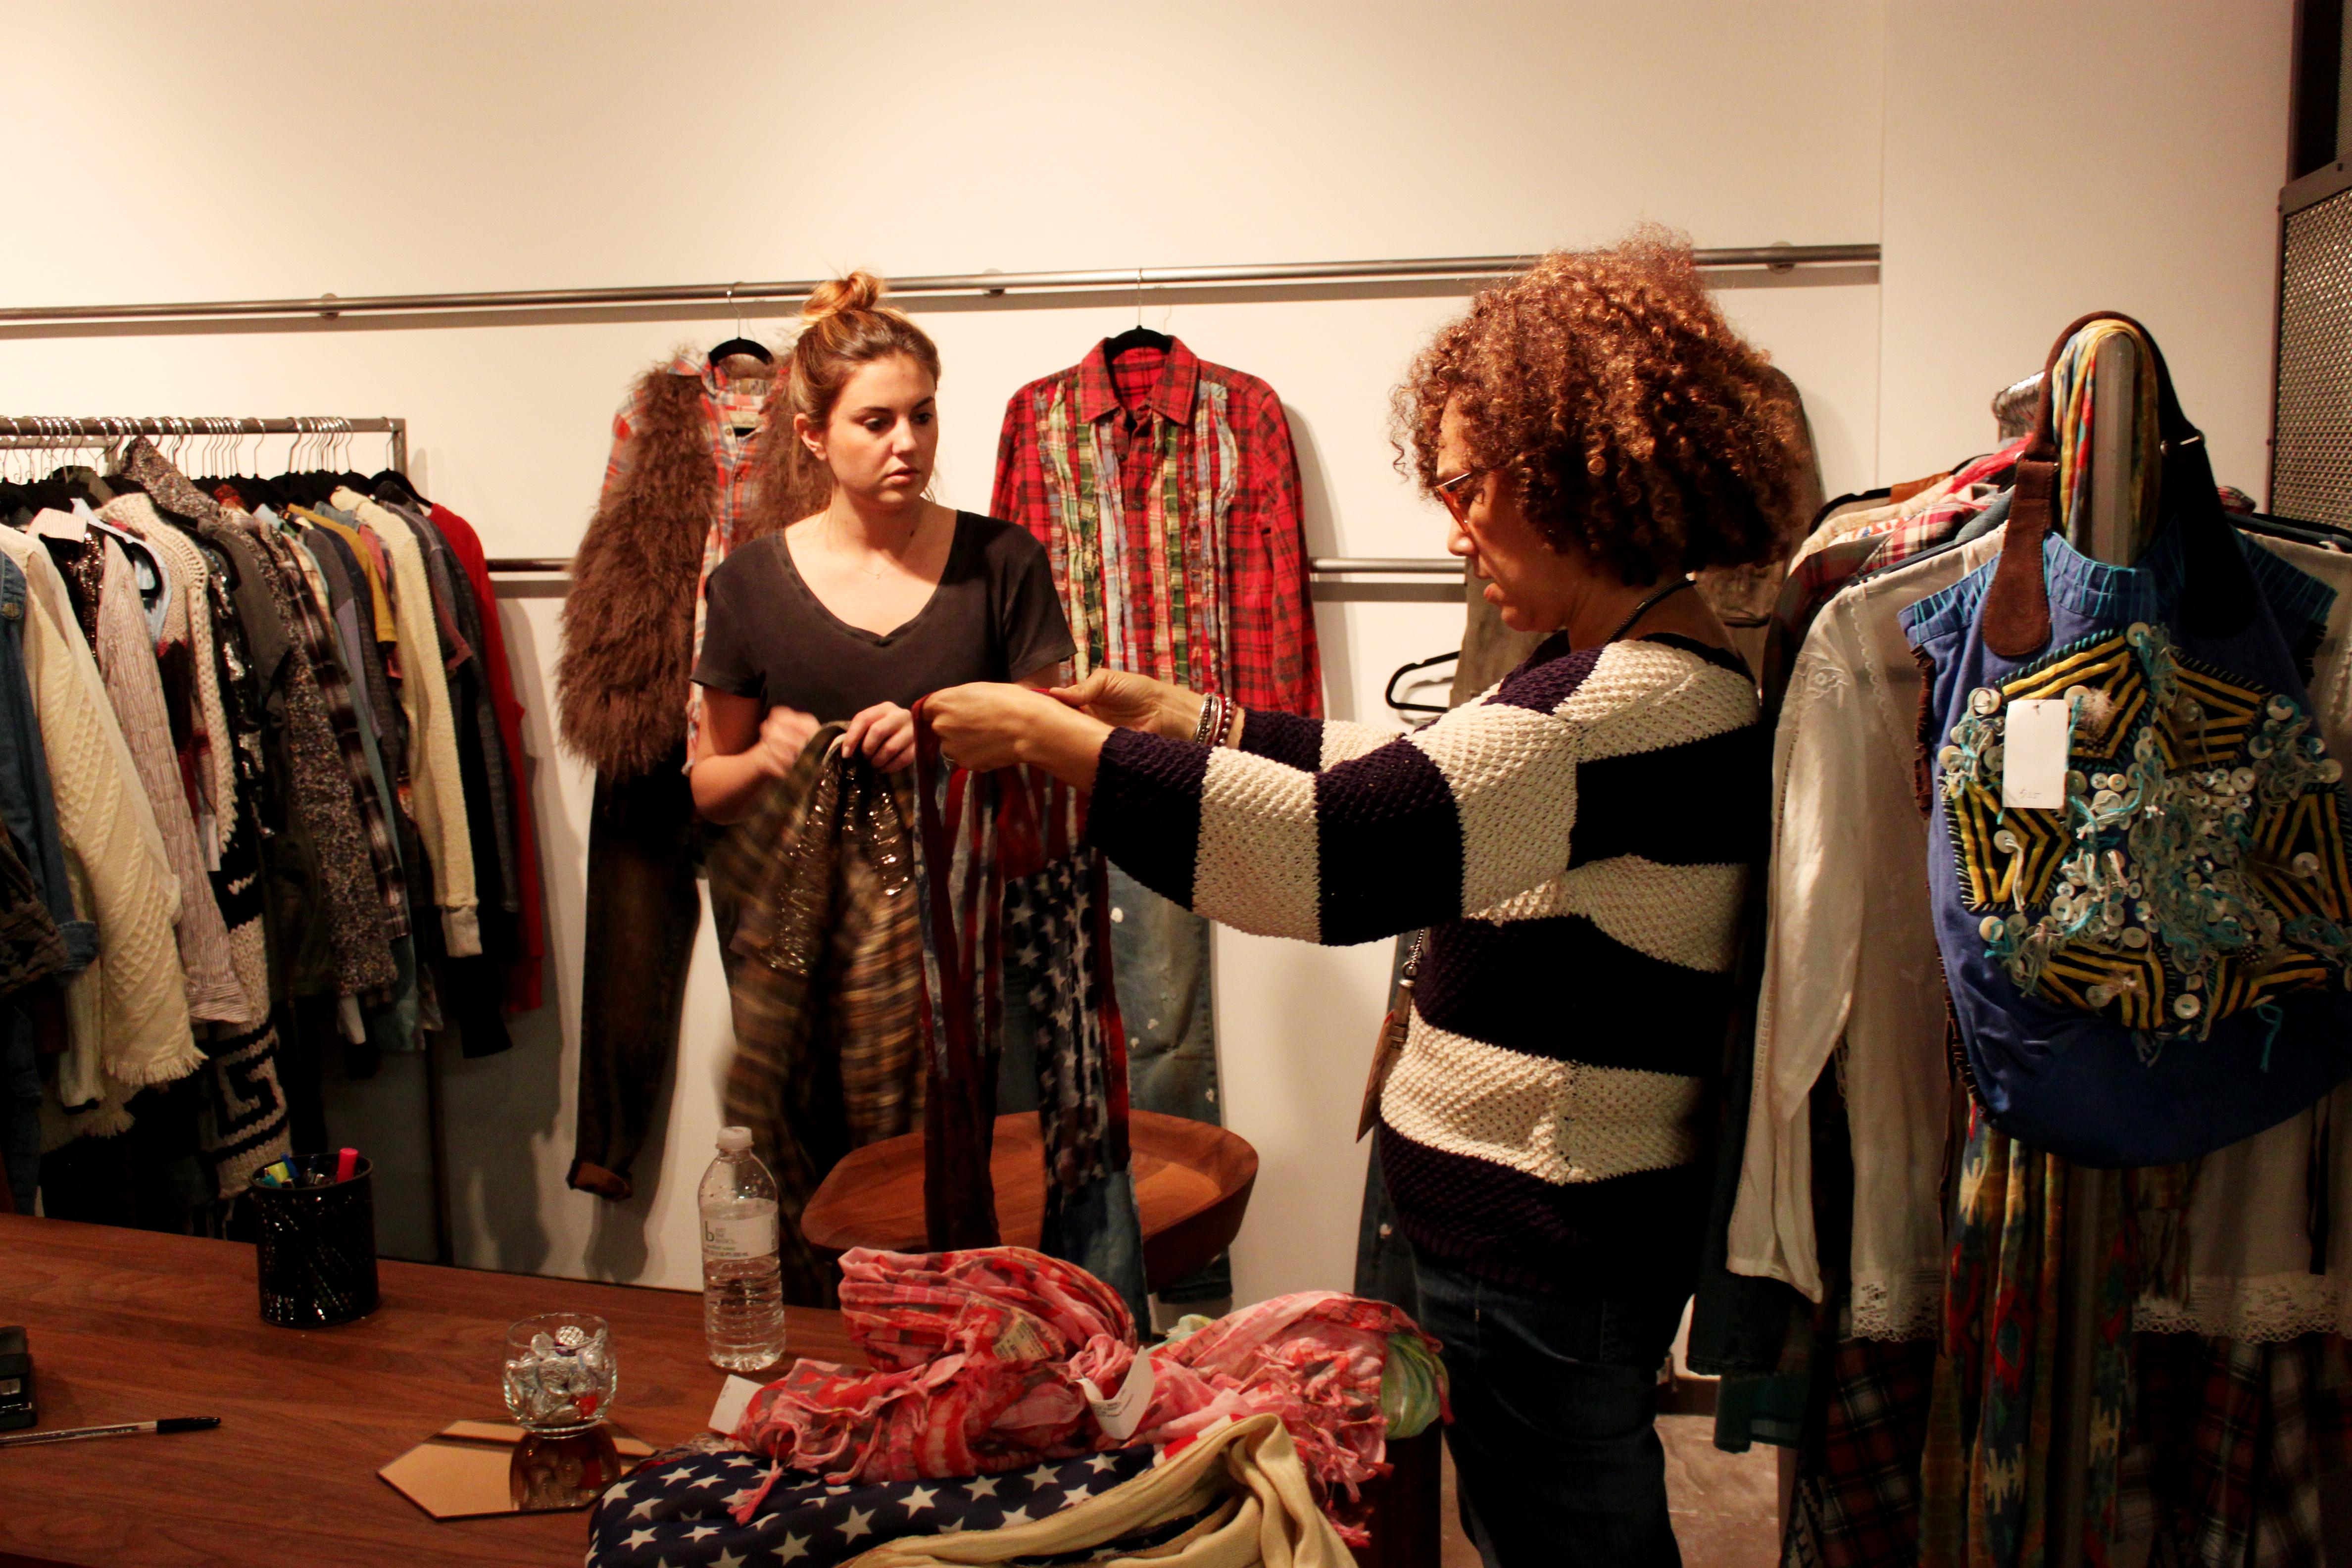 Fashion industry gallery - Fashion Industry Gallery Image Image Image Image Image Image Image